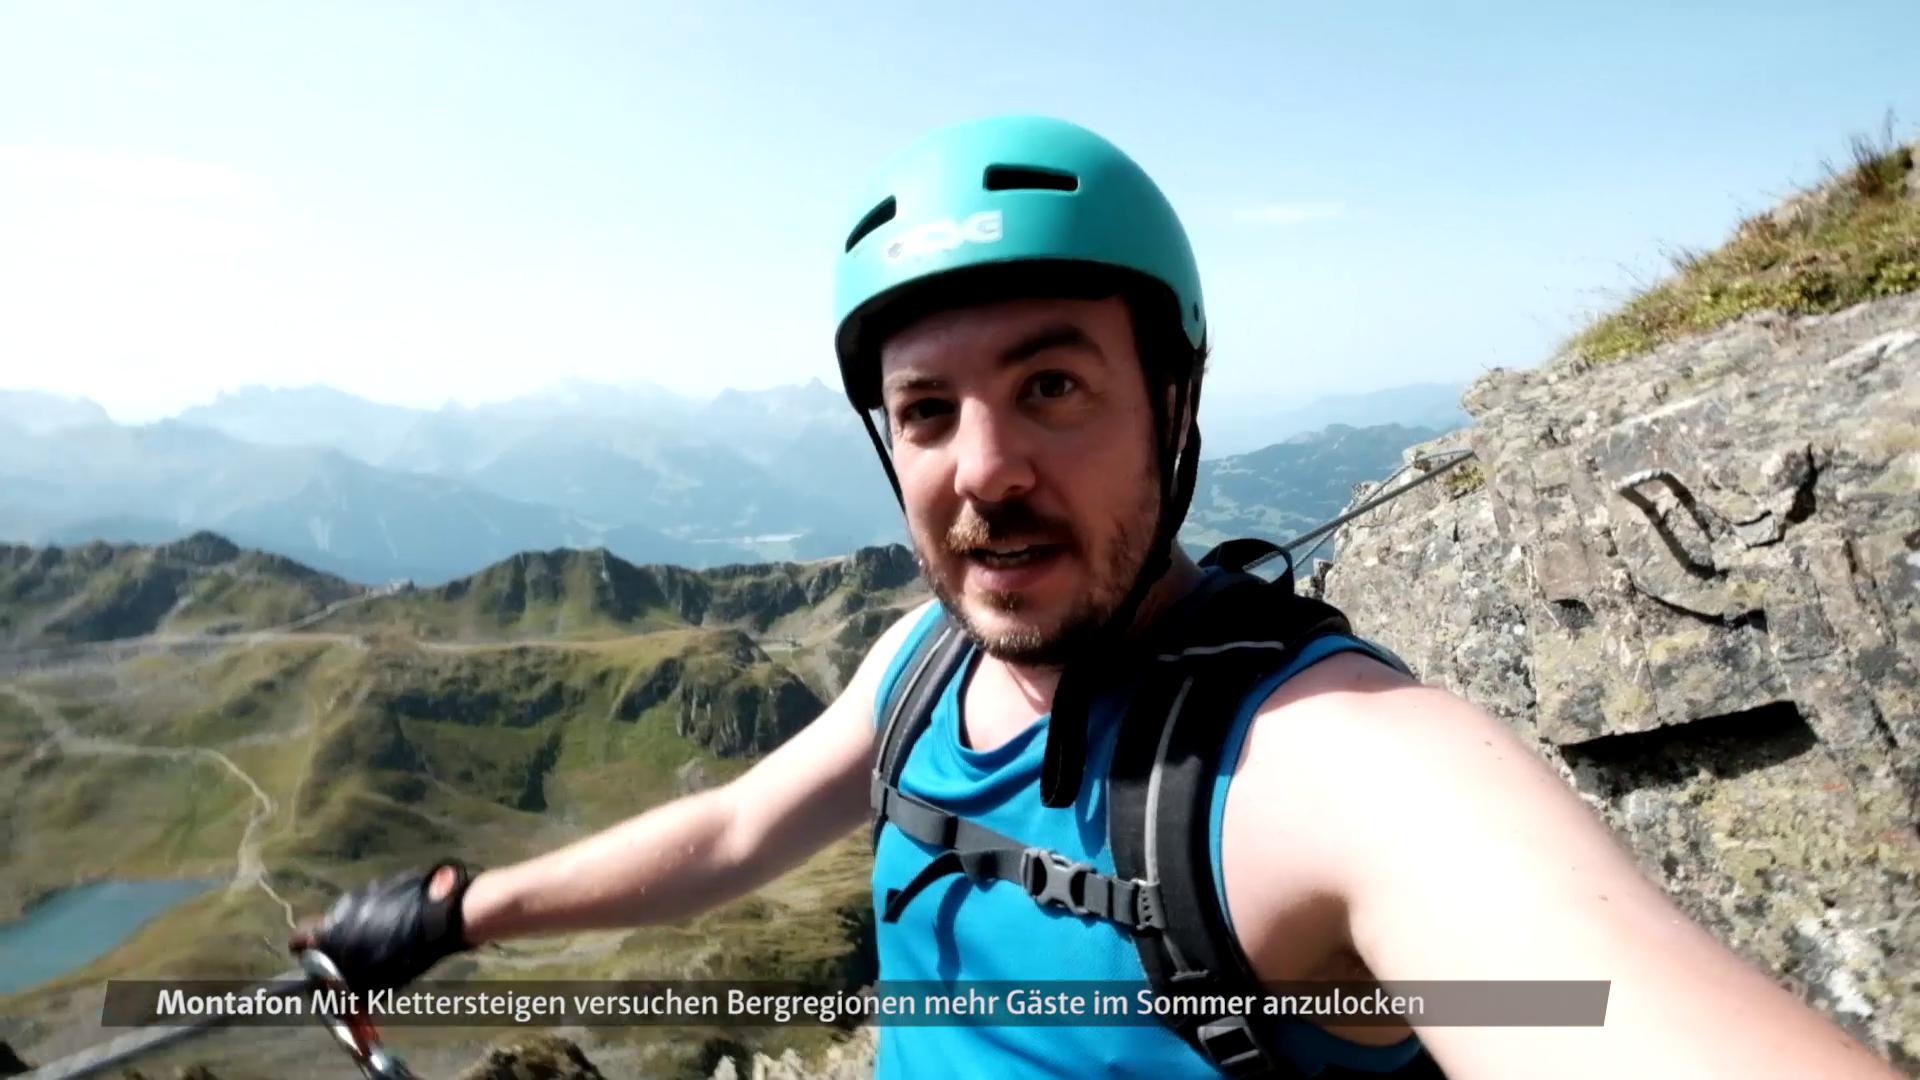 Reporter: Klettersteigtest im Montafon